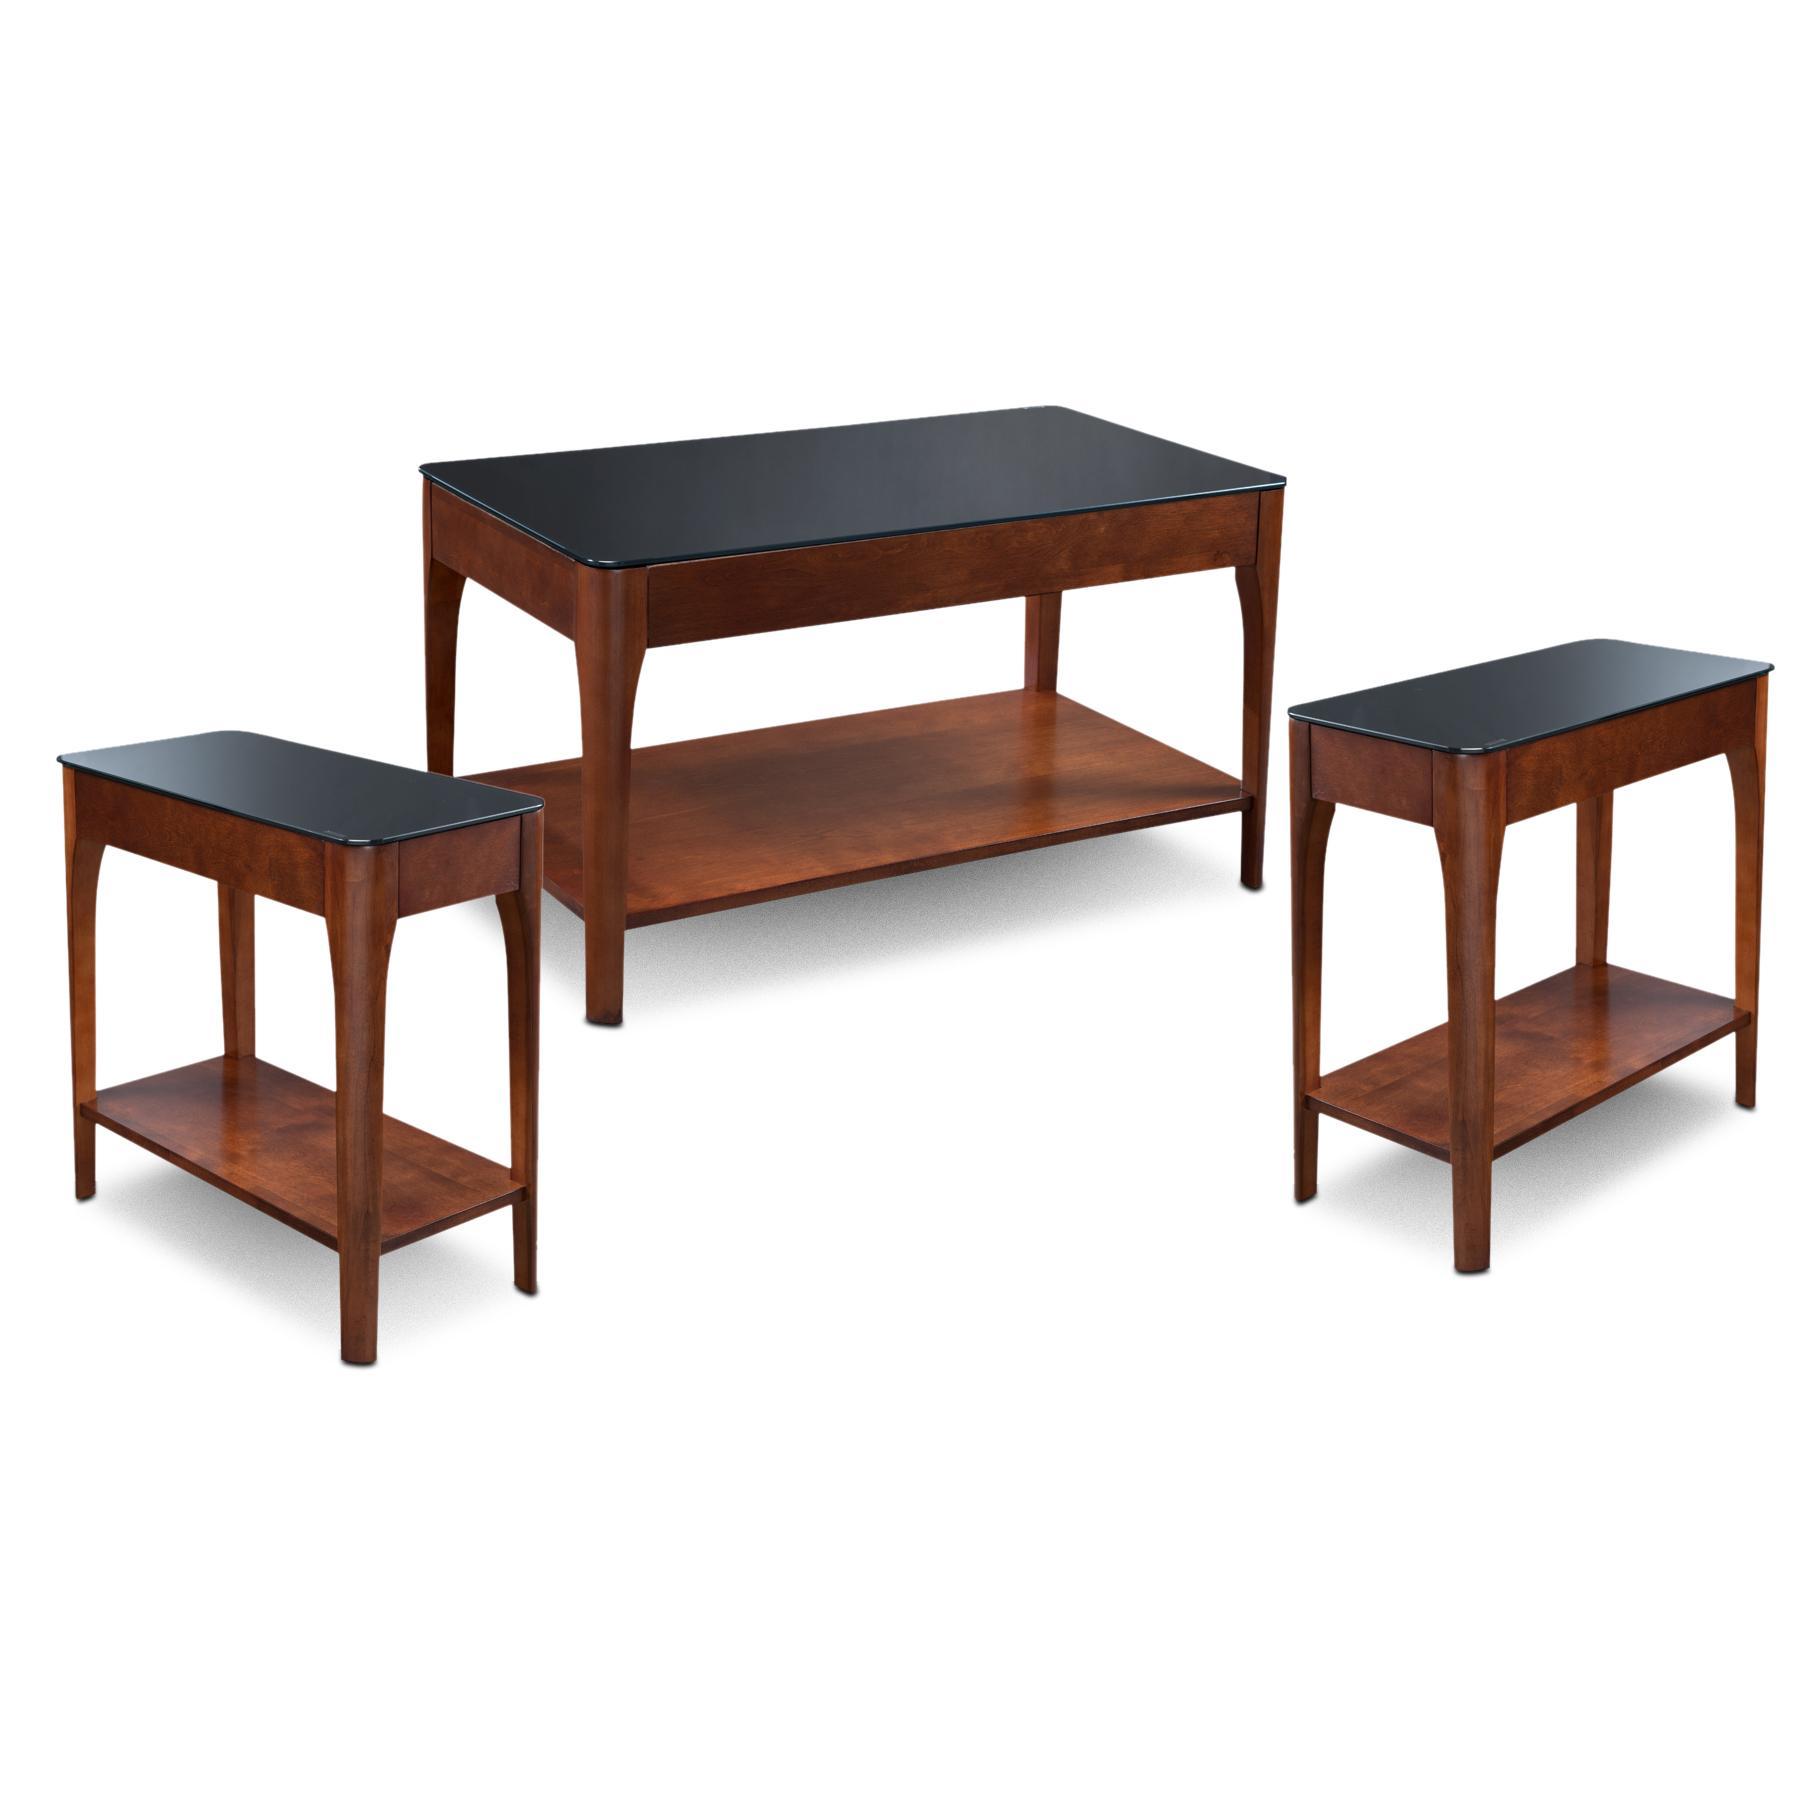 Black Glass Coffee Table Amazon: Amazon.com: Leick Glass Condo/Apartment Coffee Table & Two